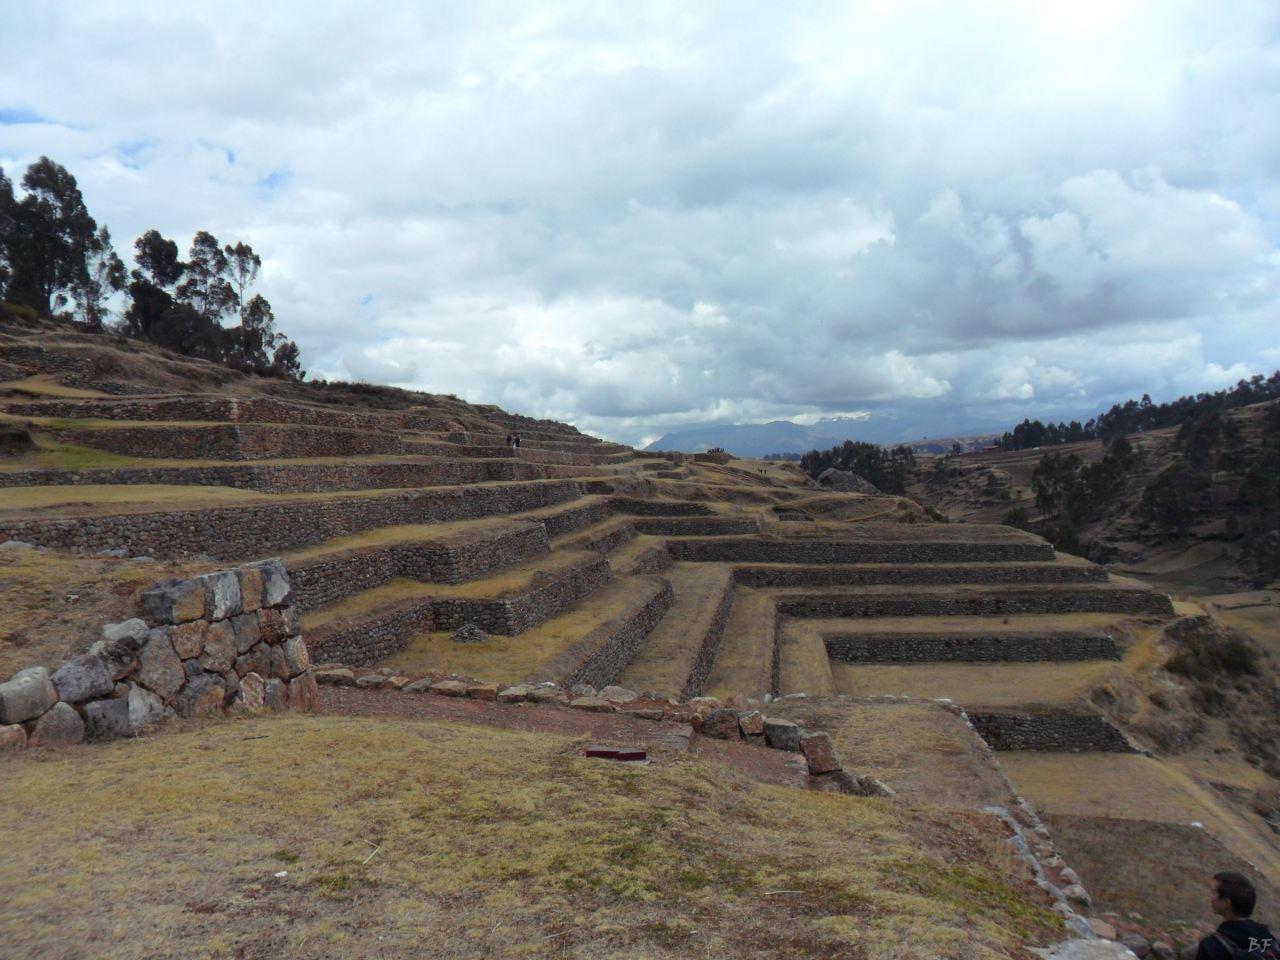 Chinchero-Mura-Poligonali-Piramide-Urubamba-Peru-62